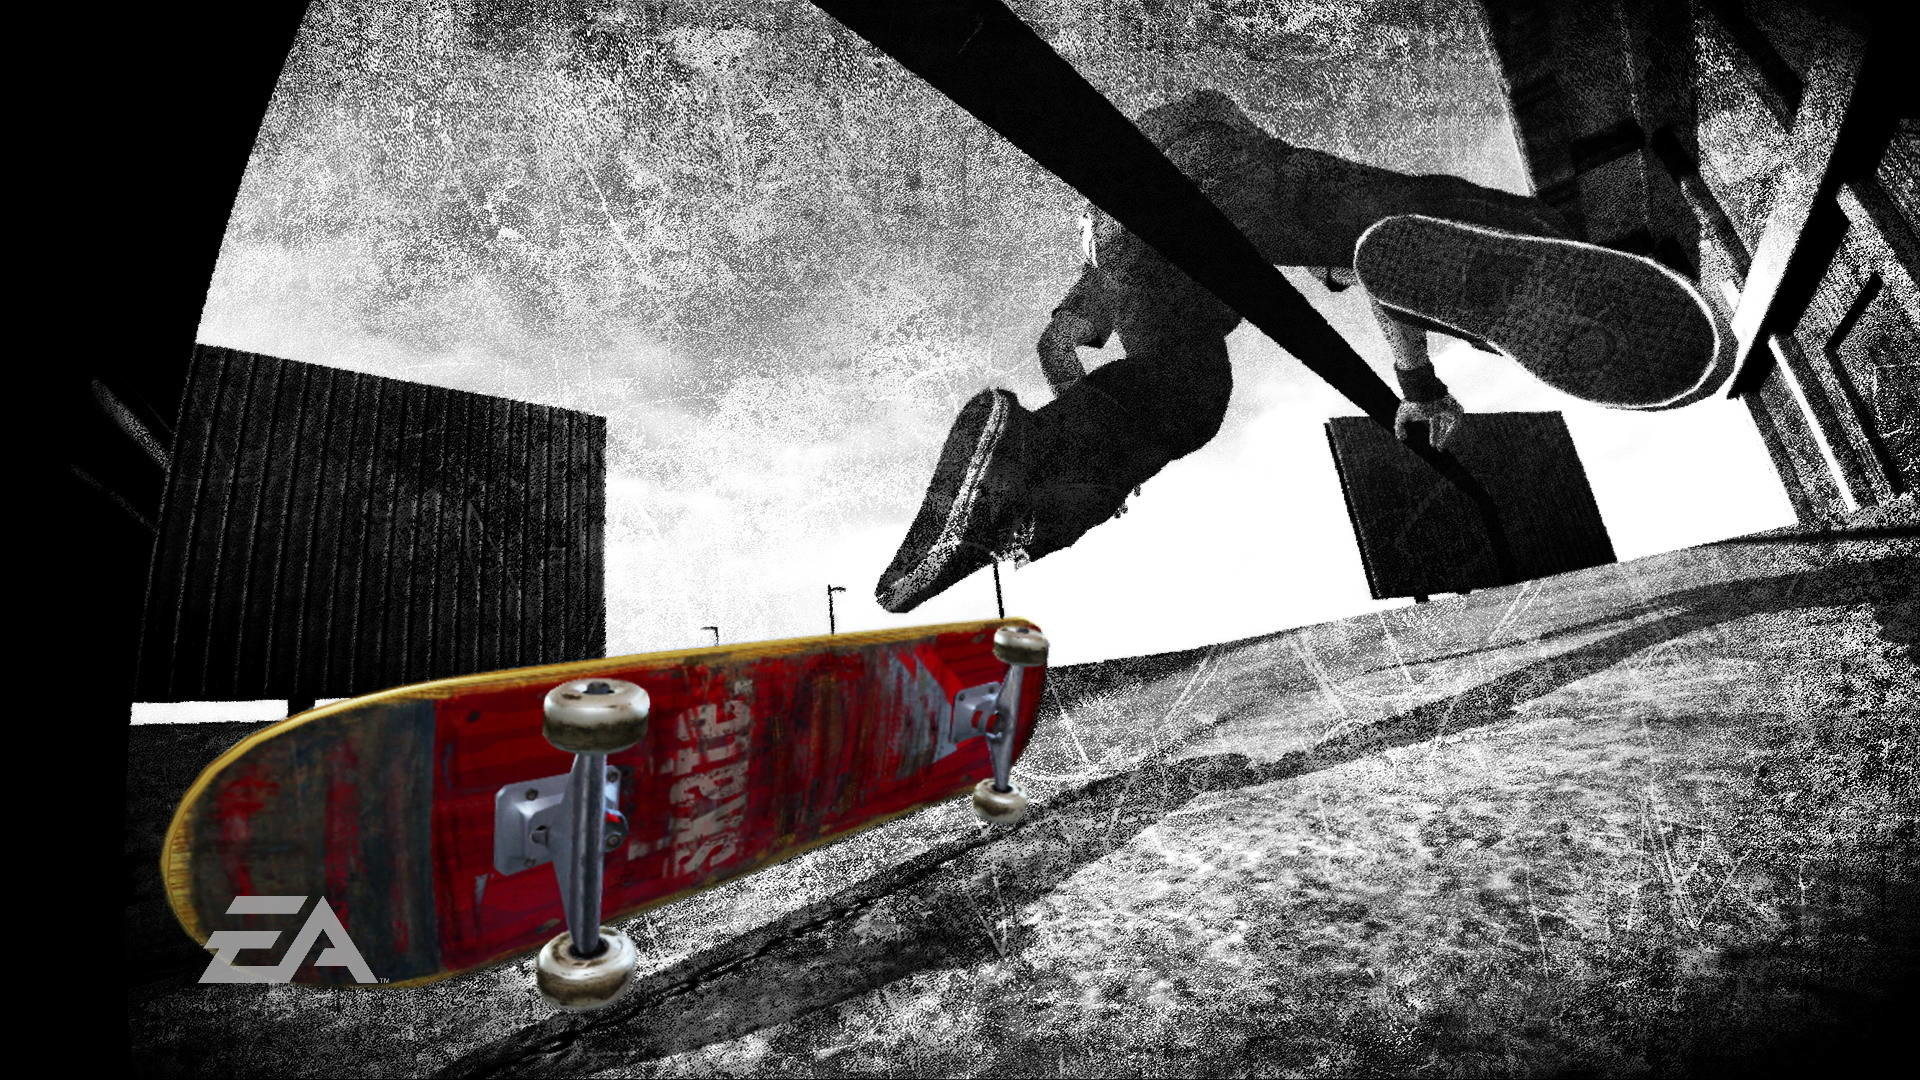 Skate Wallpaper Desktop 60 Images